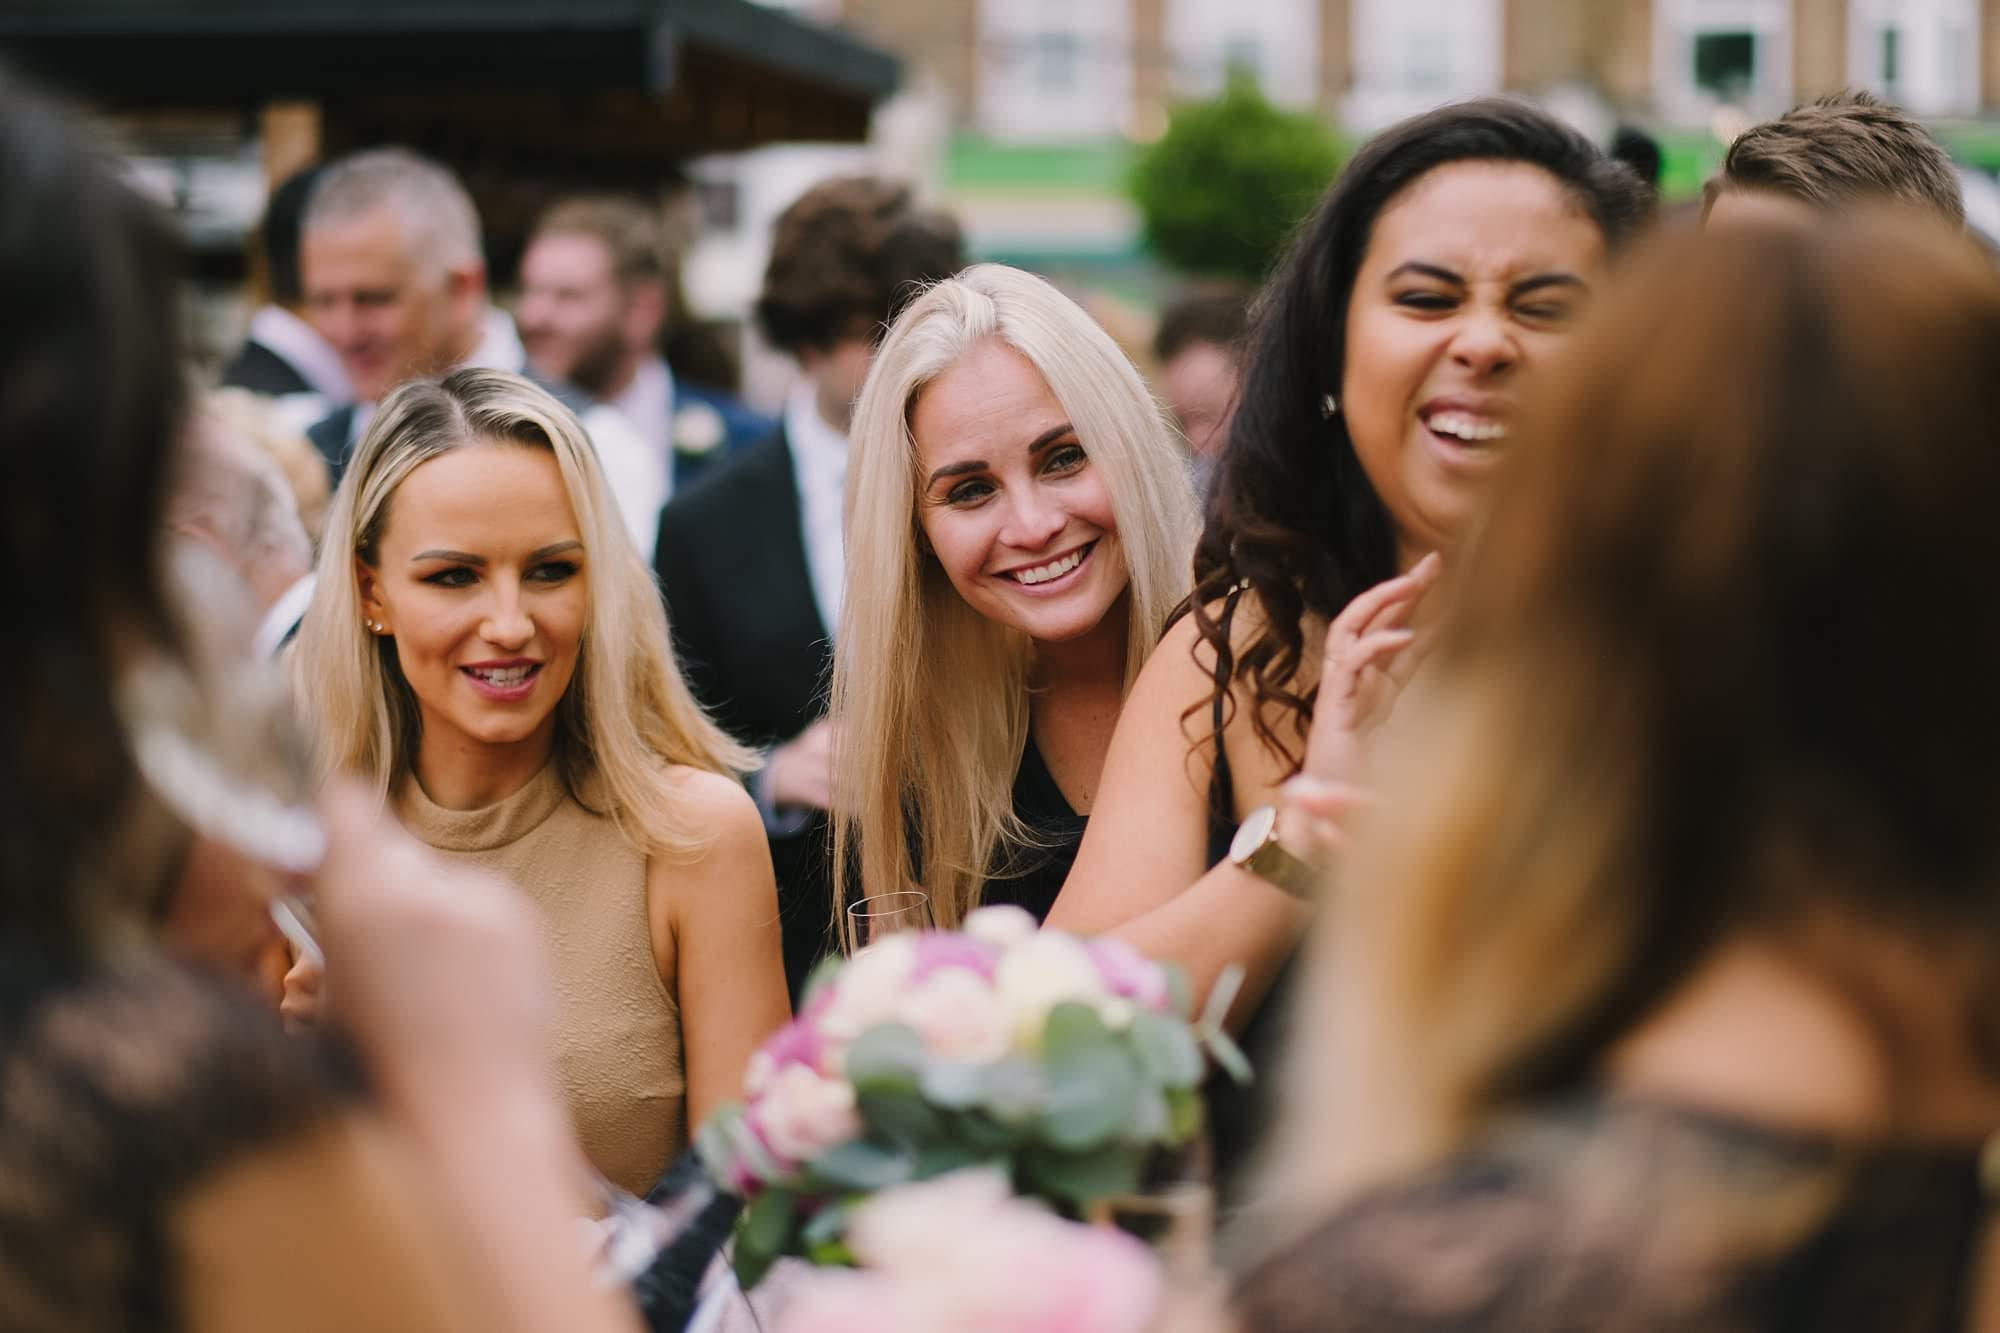 london pub wedding photographer jn 018 - The County Arms Wedding Photographer   Jen & Nick